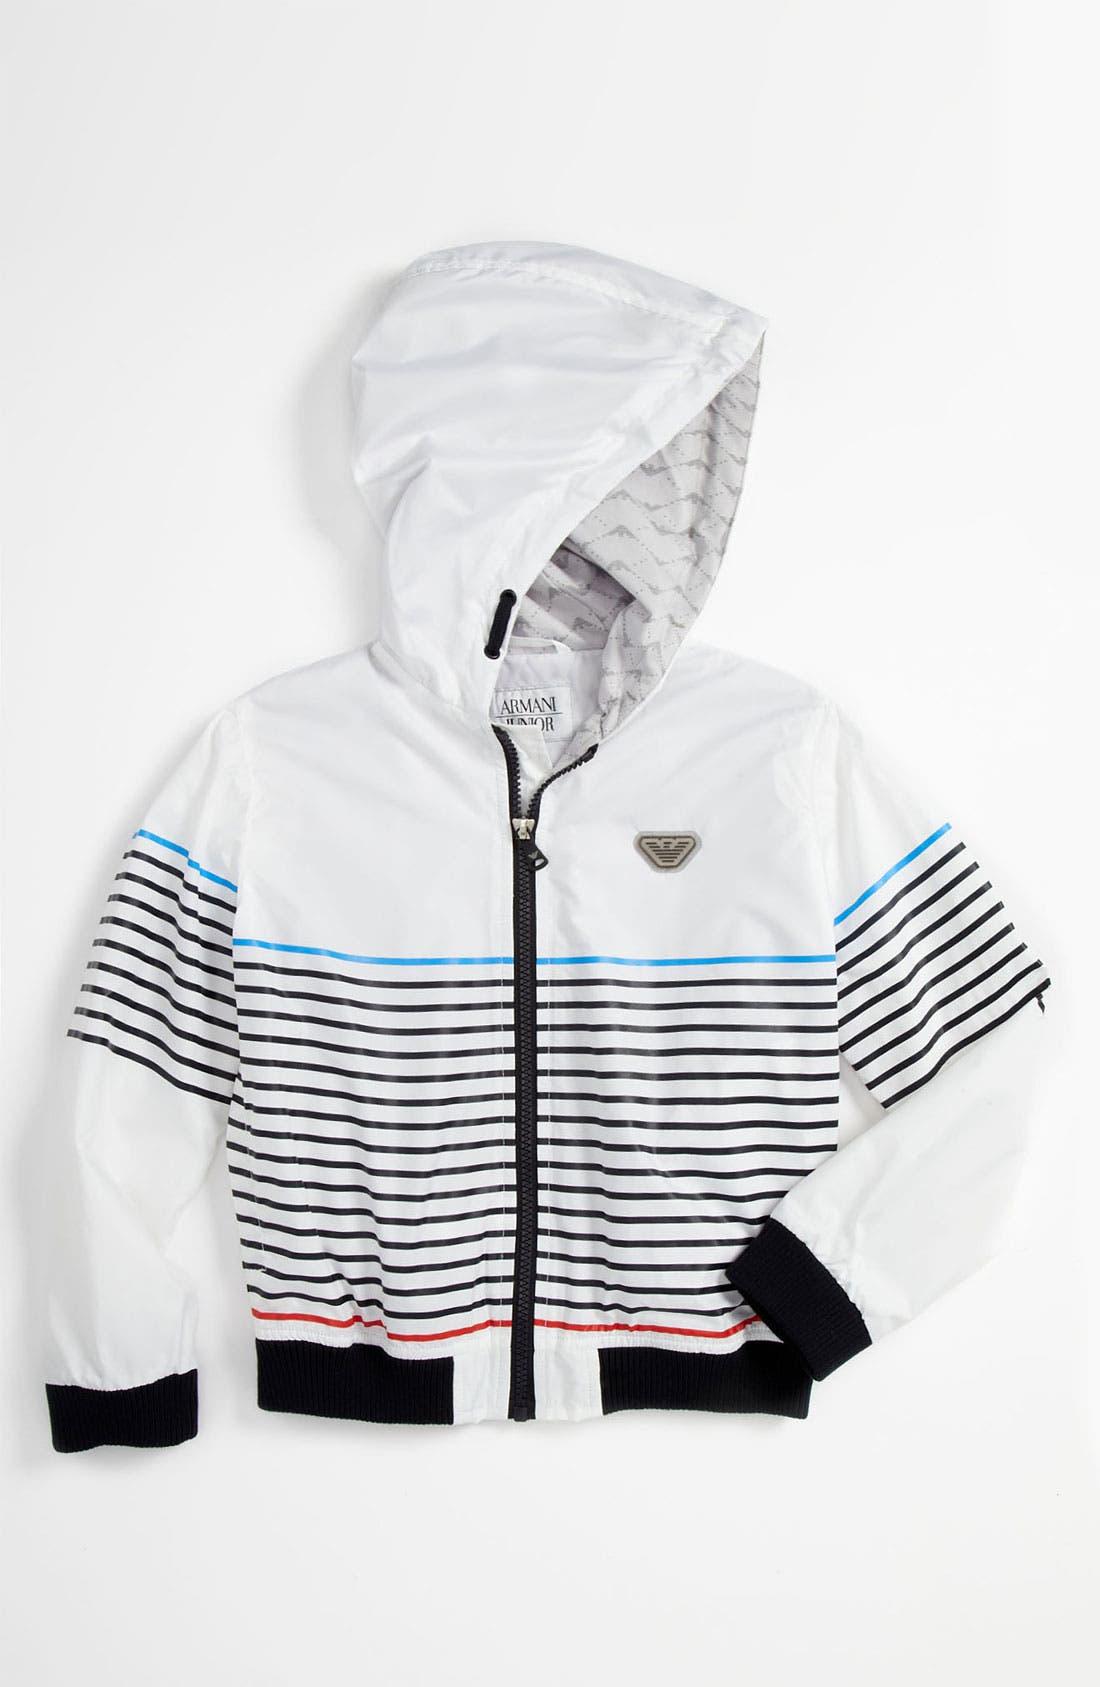 Main Image - Armani Junior Stripe Jacket (Toddler & Little Boys)